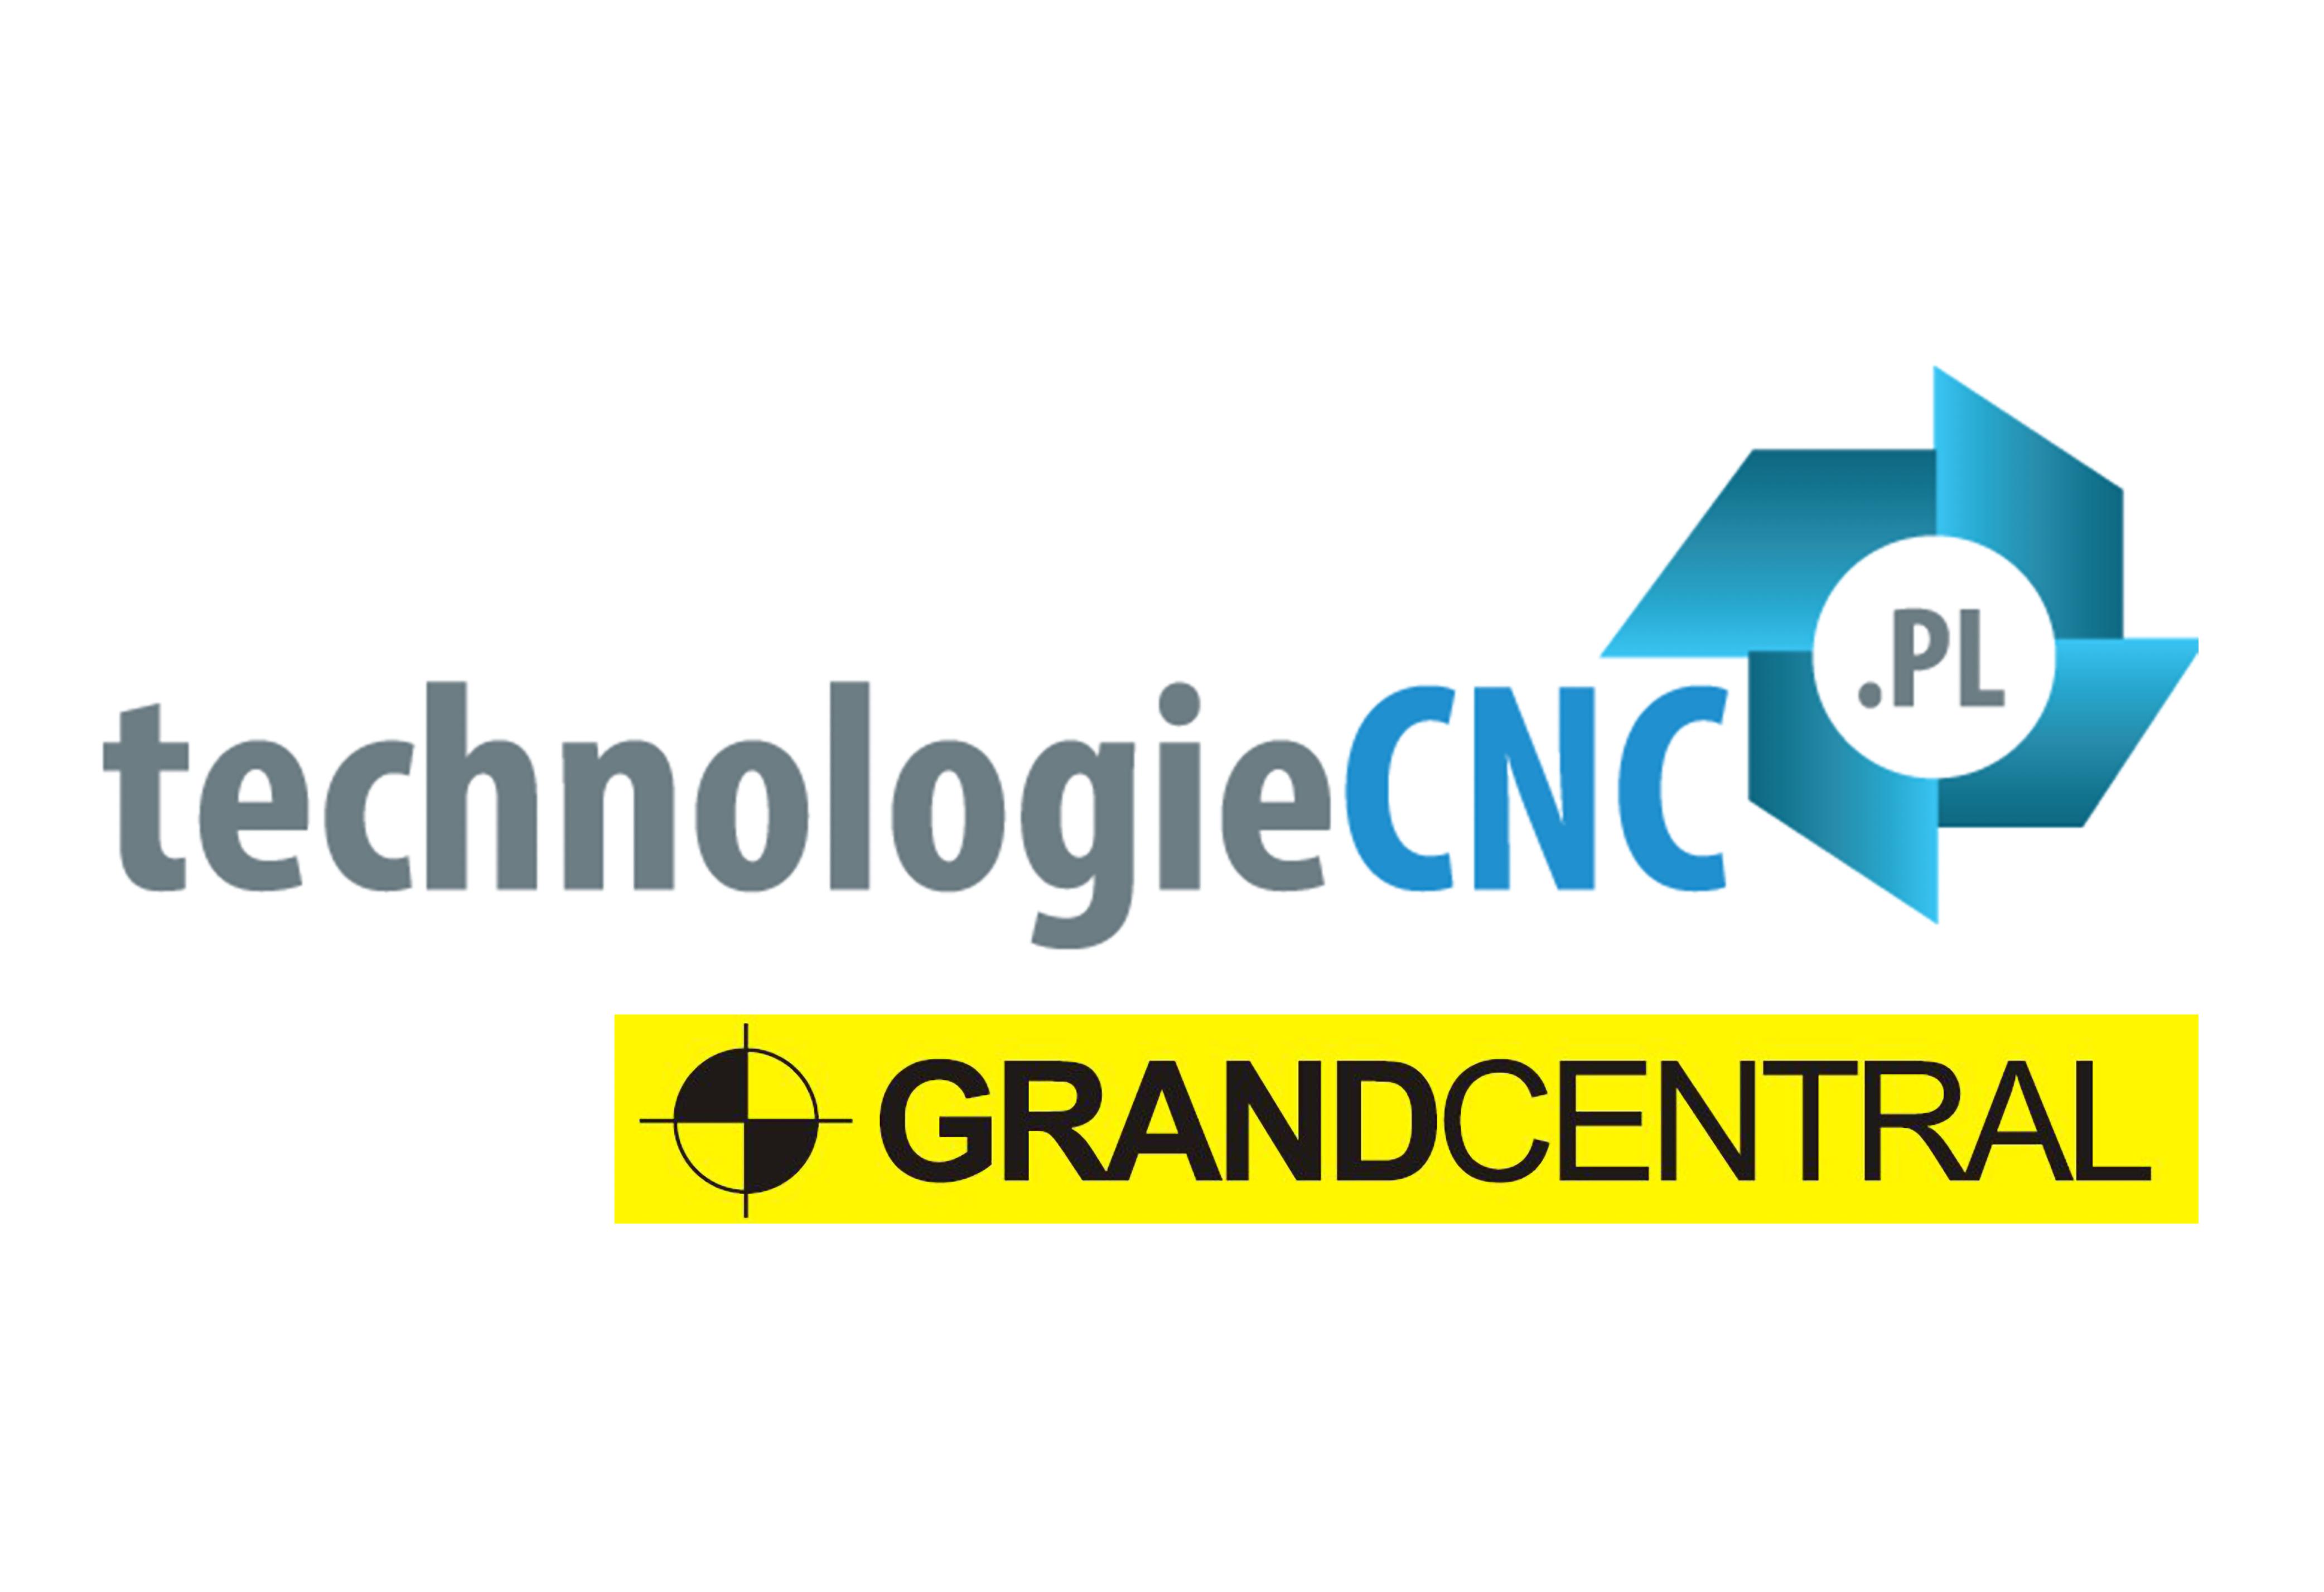 tehnologieCNC